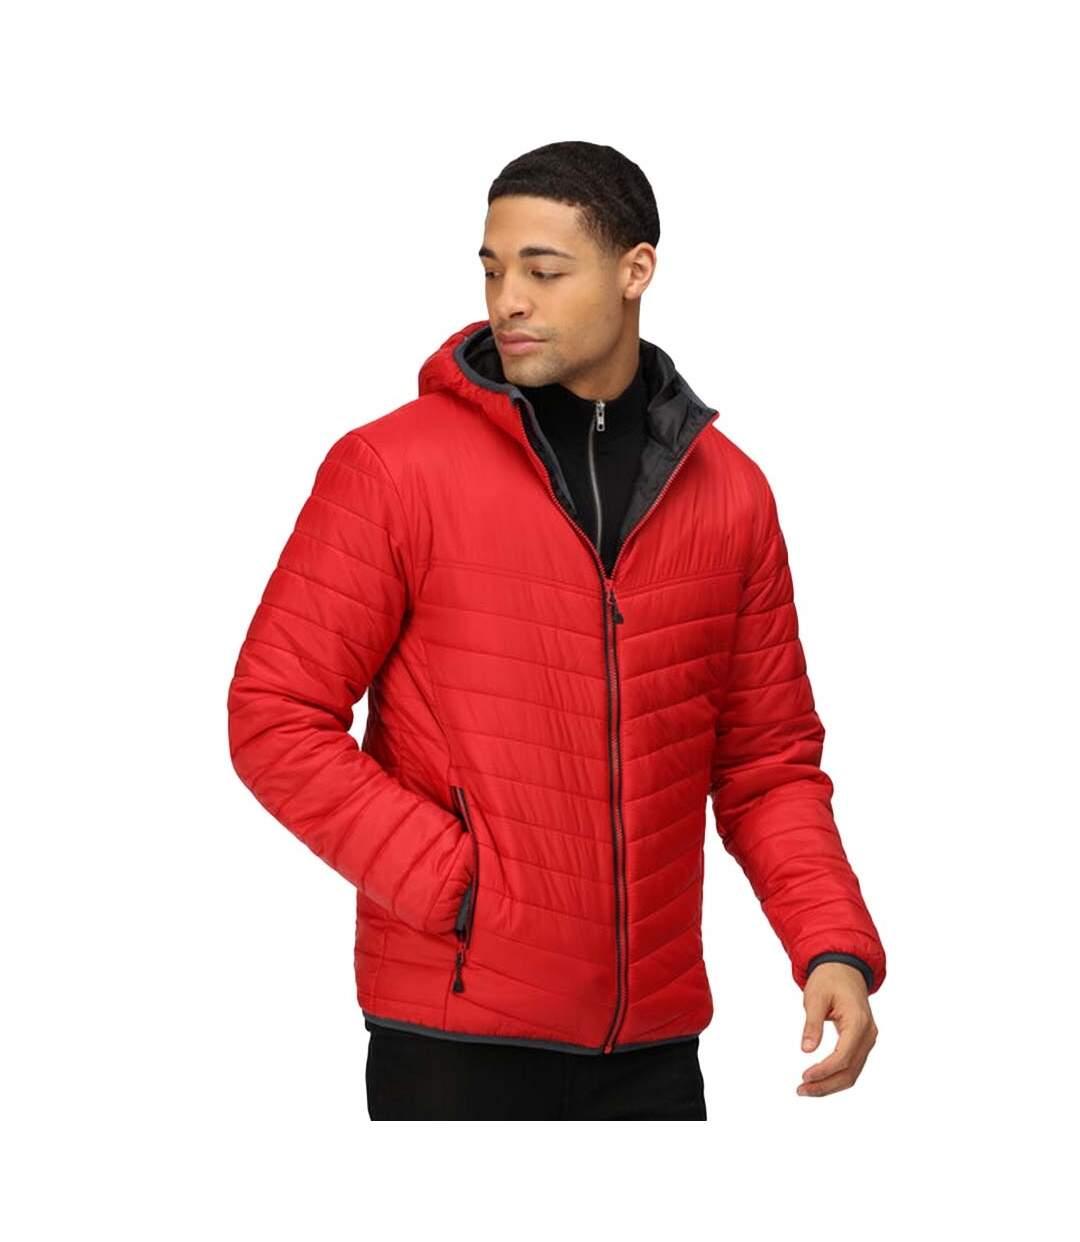 Regatta Mens Acadia II Hooded Jacket (Luminous Red/Jet Black) - UTRG3745